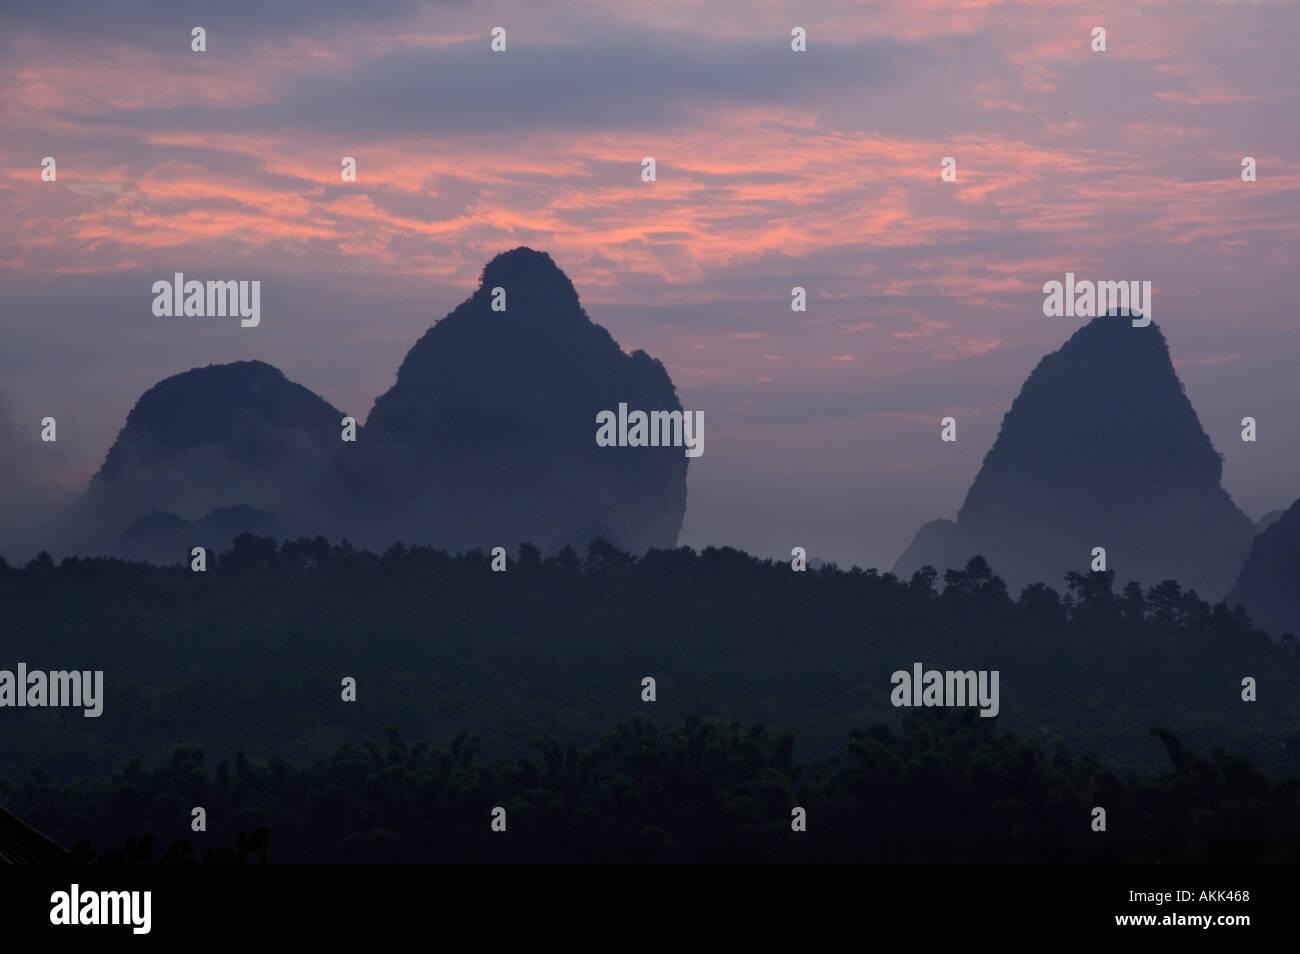 China, la provincia de Guangxi, Yangshuo County - picos de Karst en Río Li al amanecer. Foto de stock